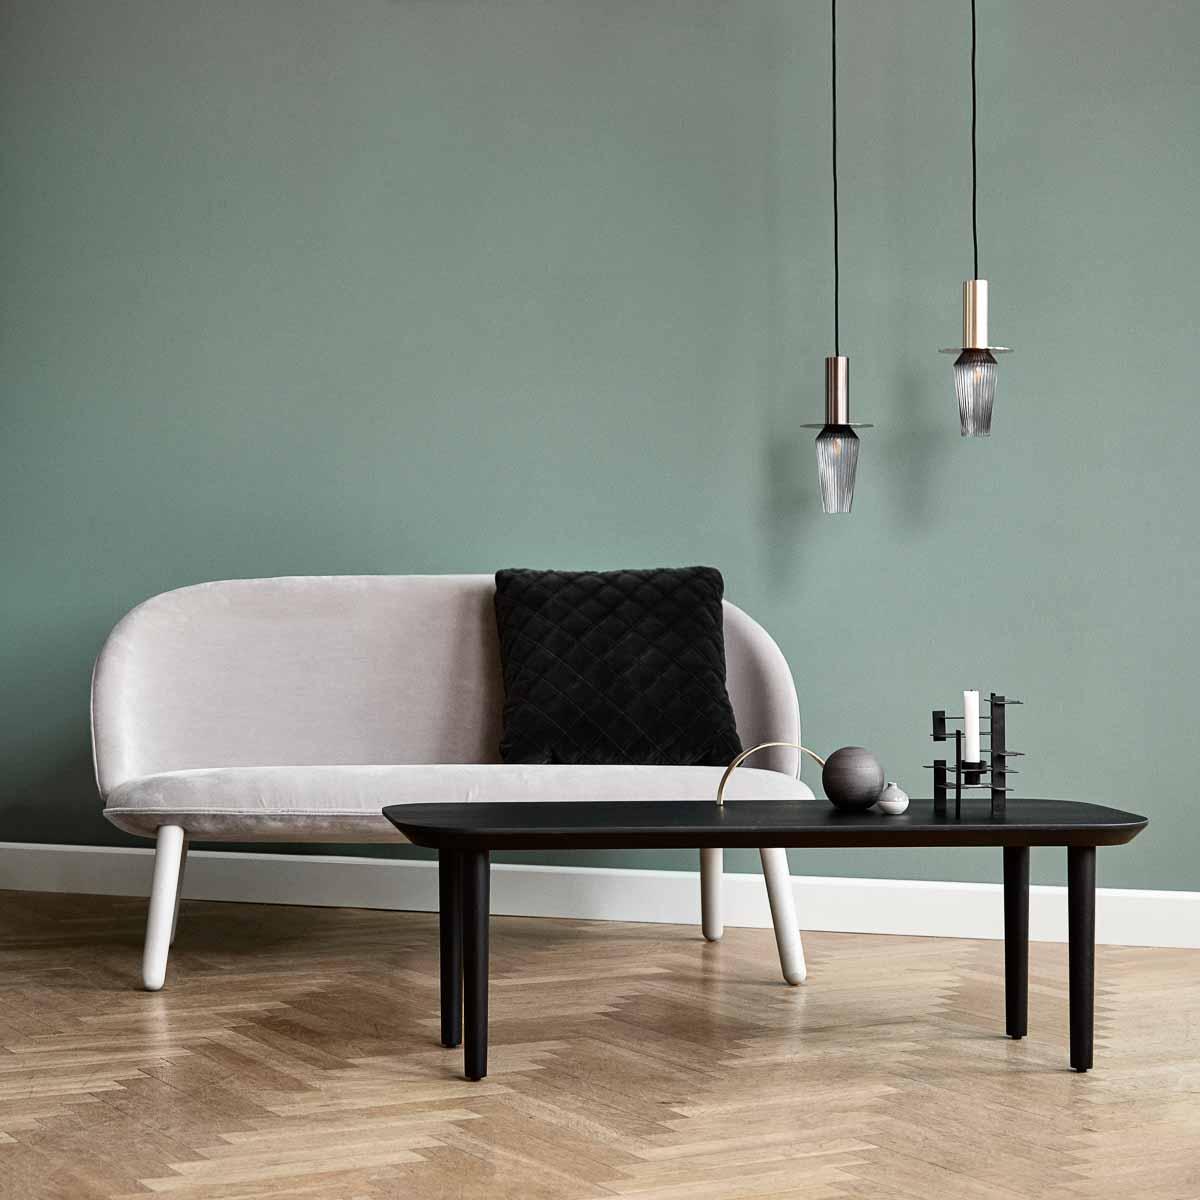 Coffee Table von Lindebjerg Design-2